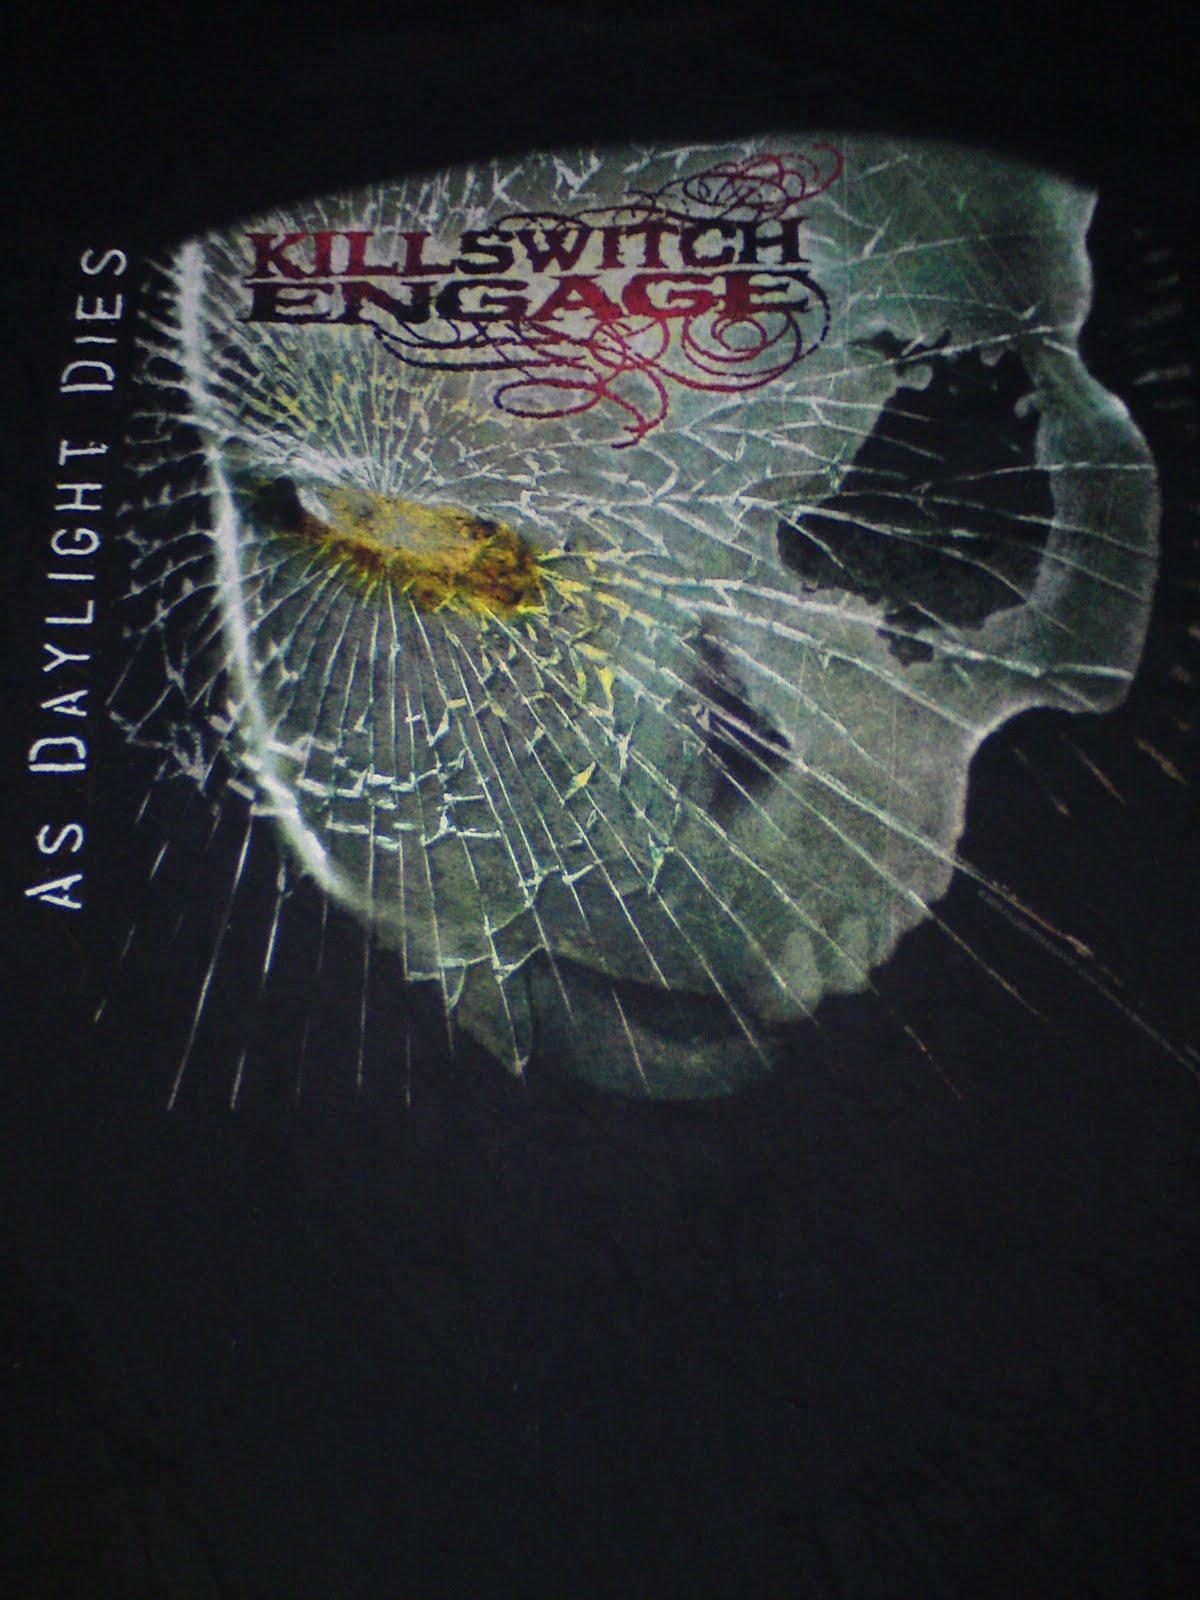 Daylight Dies Shirt as Daylight Dies Album